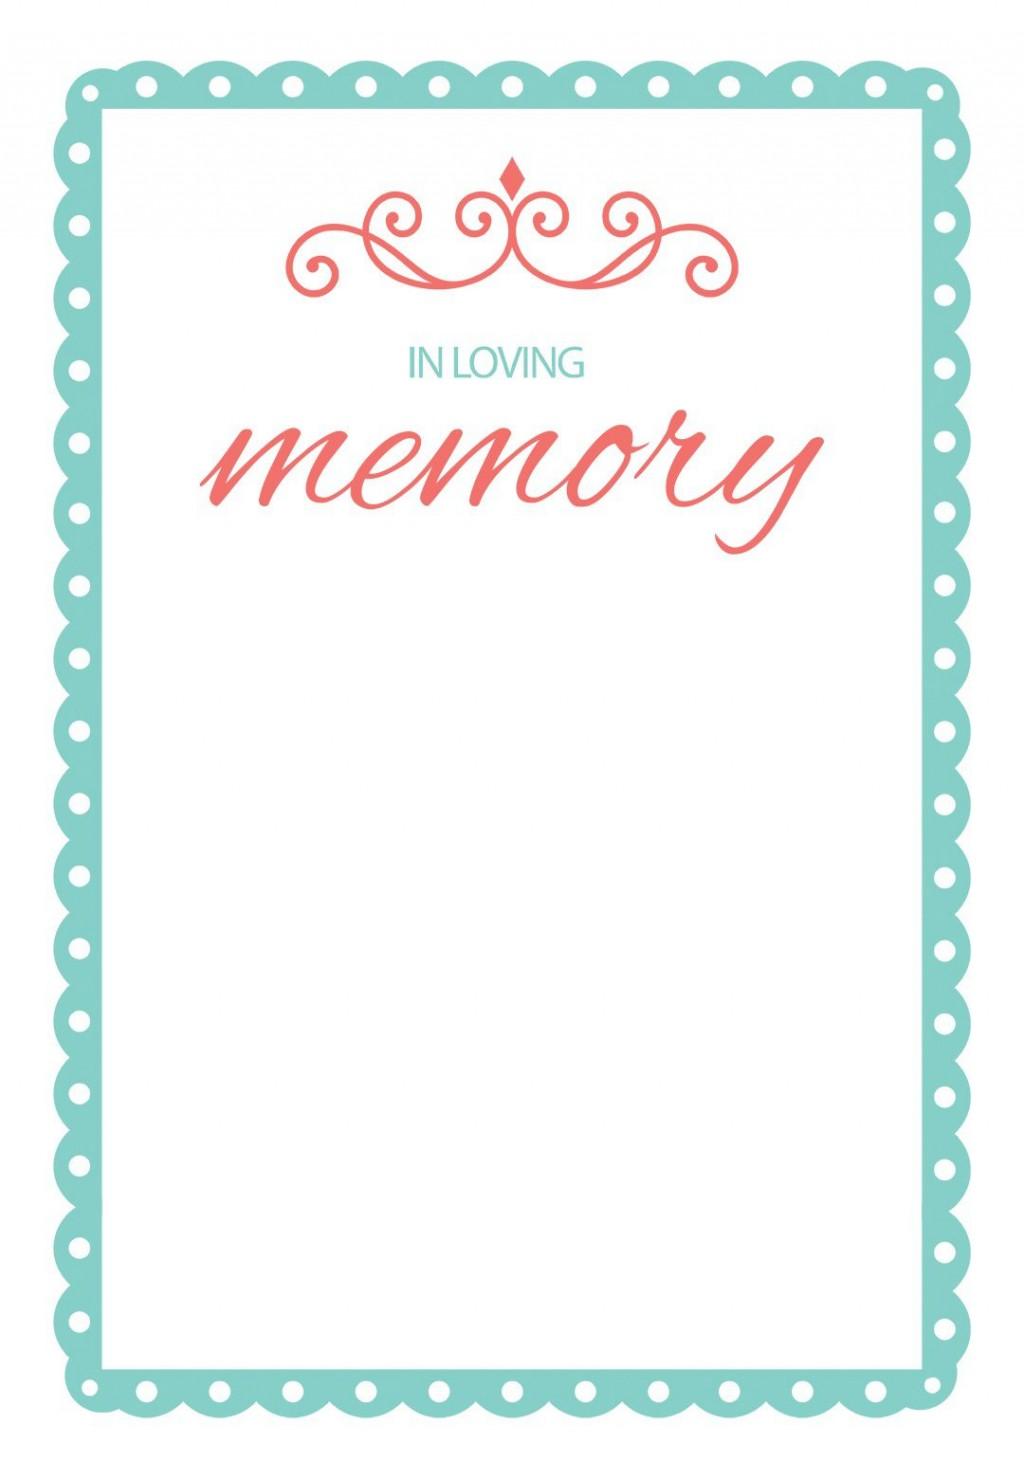 000 Impressive In Loving Memory Template Design  Free PowerpointLarge